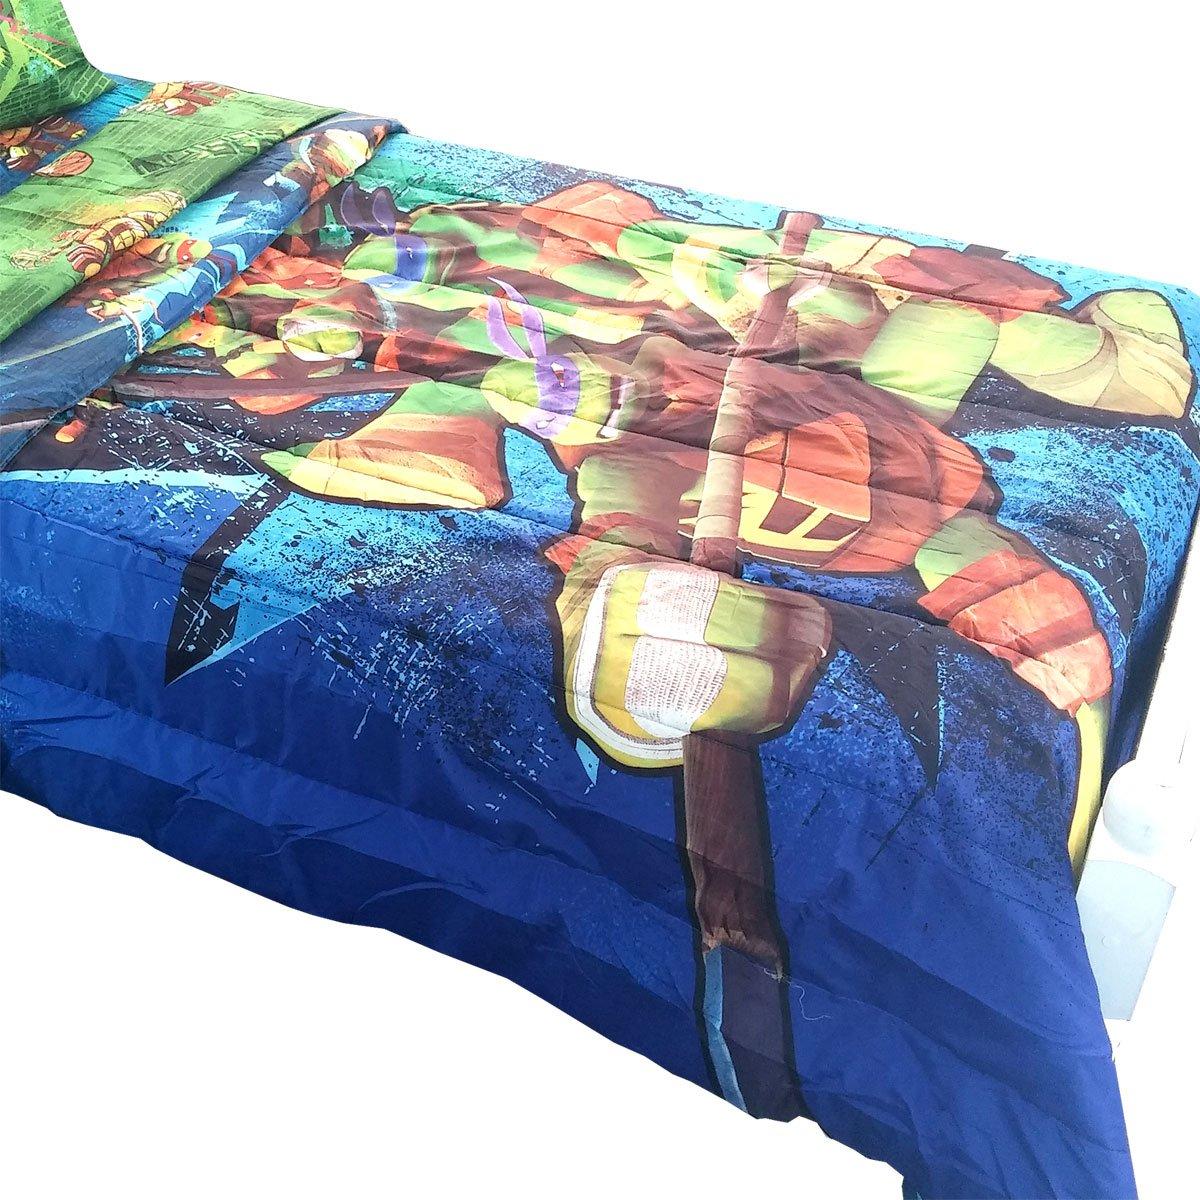 amazoncom teenage mutant ninja turtles twinfull bed comforter time to shell up bedding home u0026 kitchen